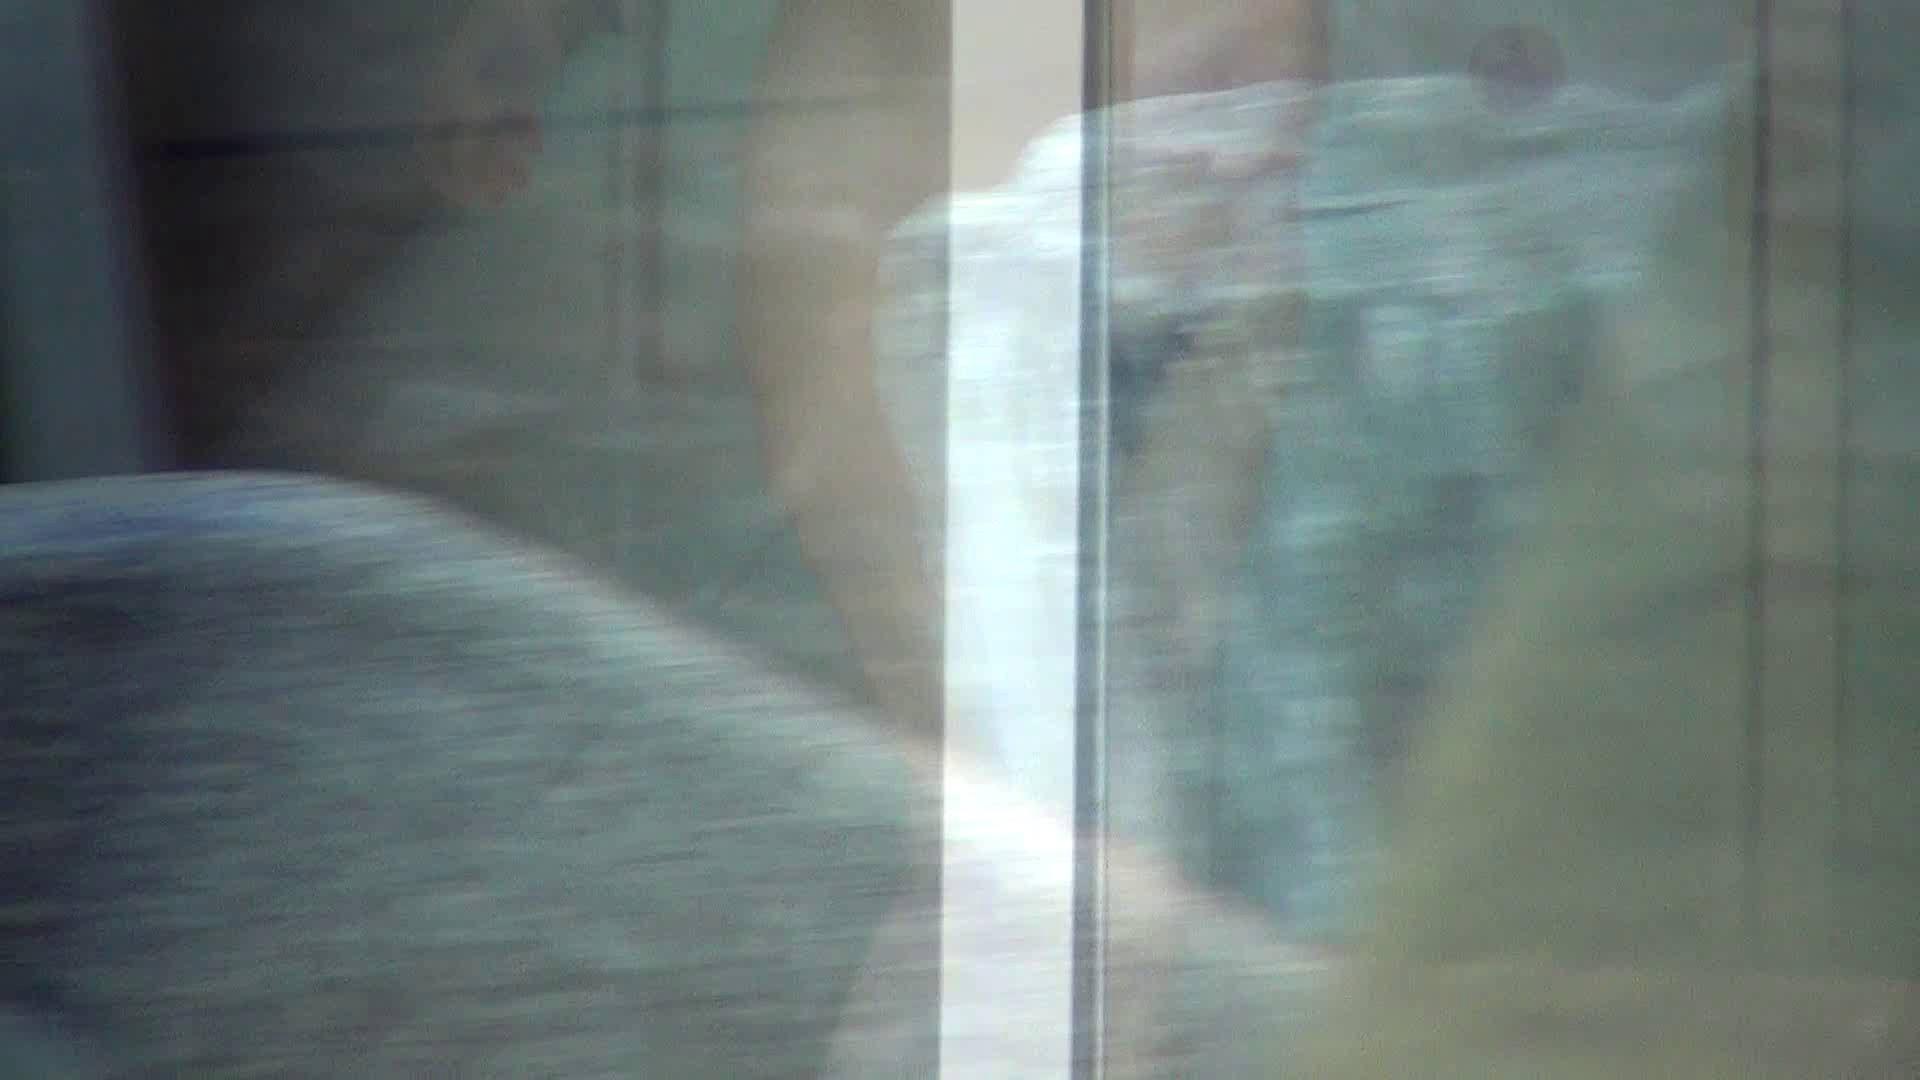 Vol.49 久々登場妊婦に興奮 黒乳首 エッチすぎる美女 | 乳首くっきり  101連発 71